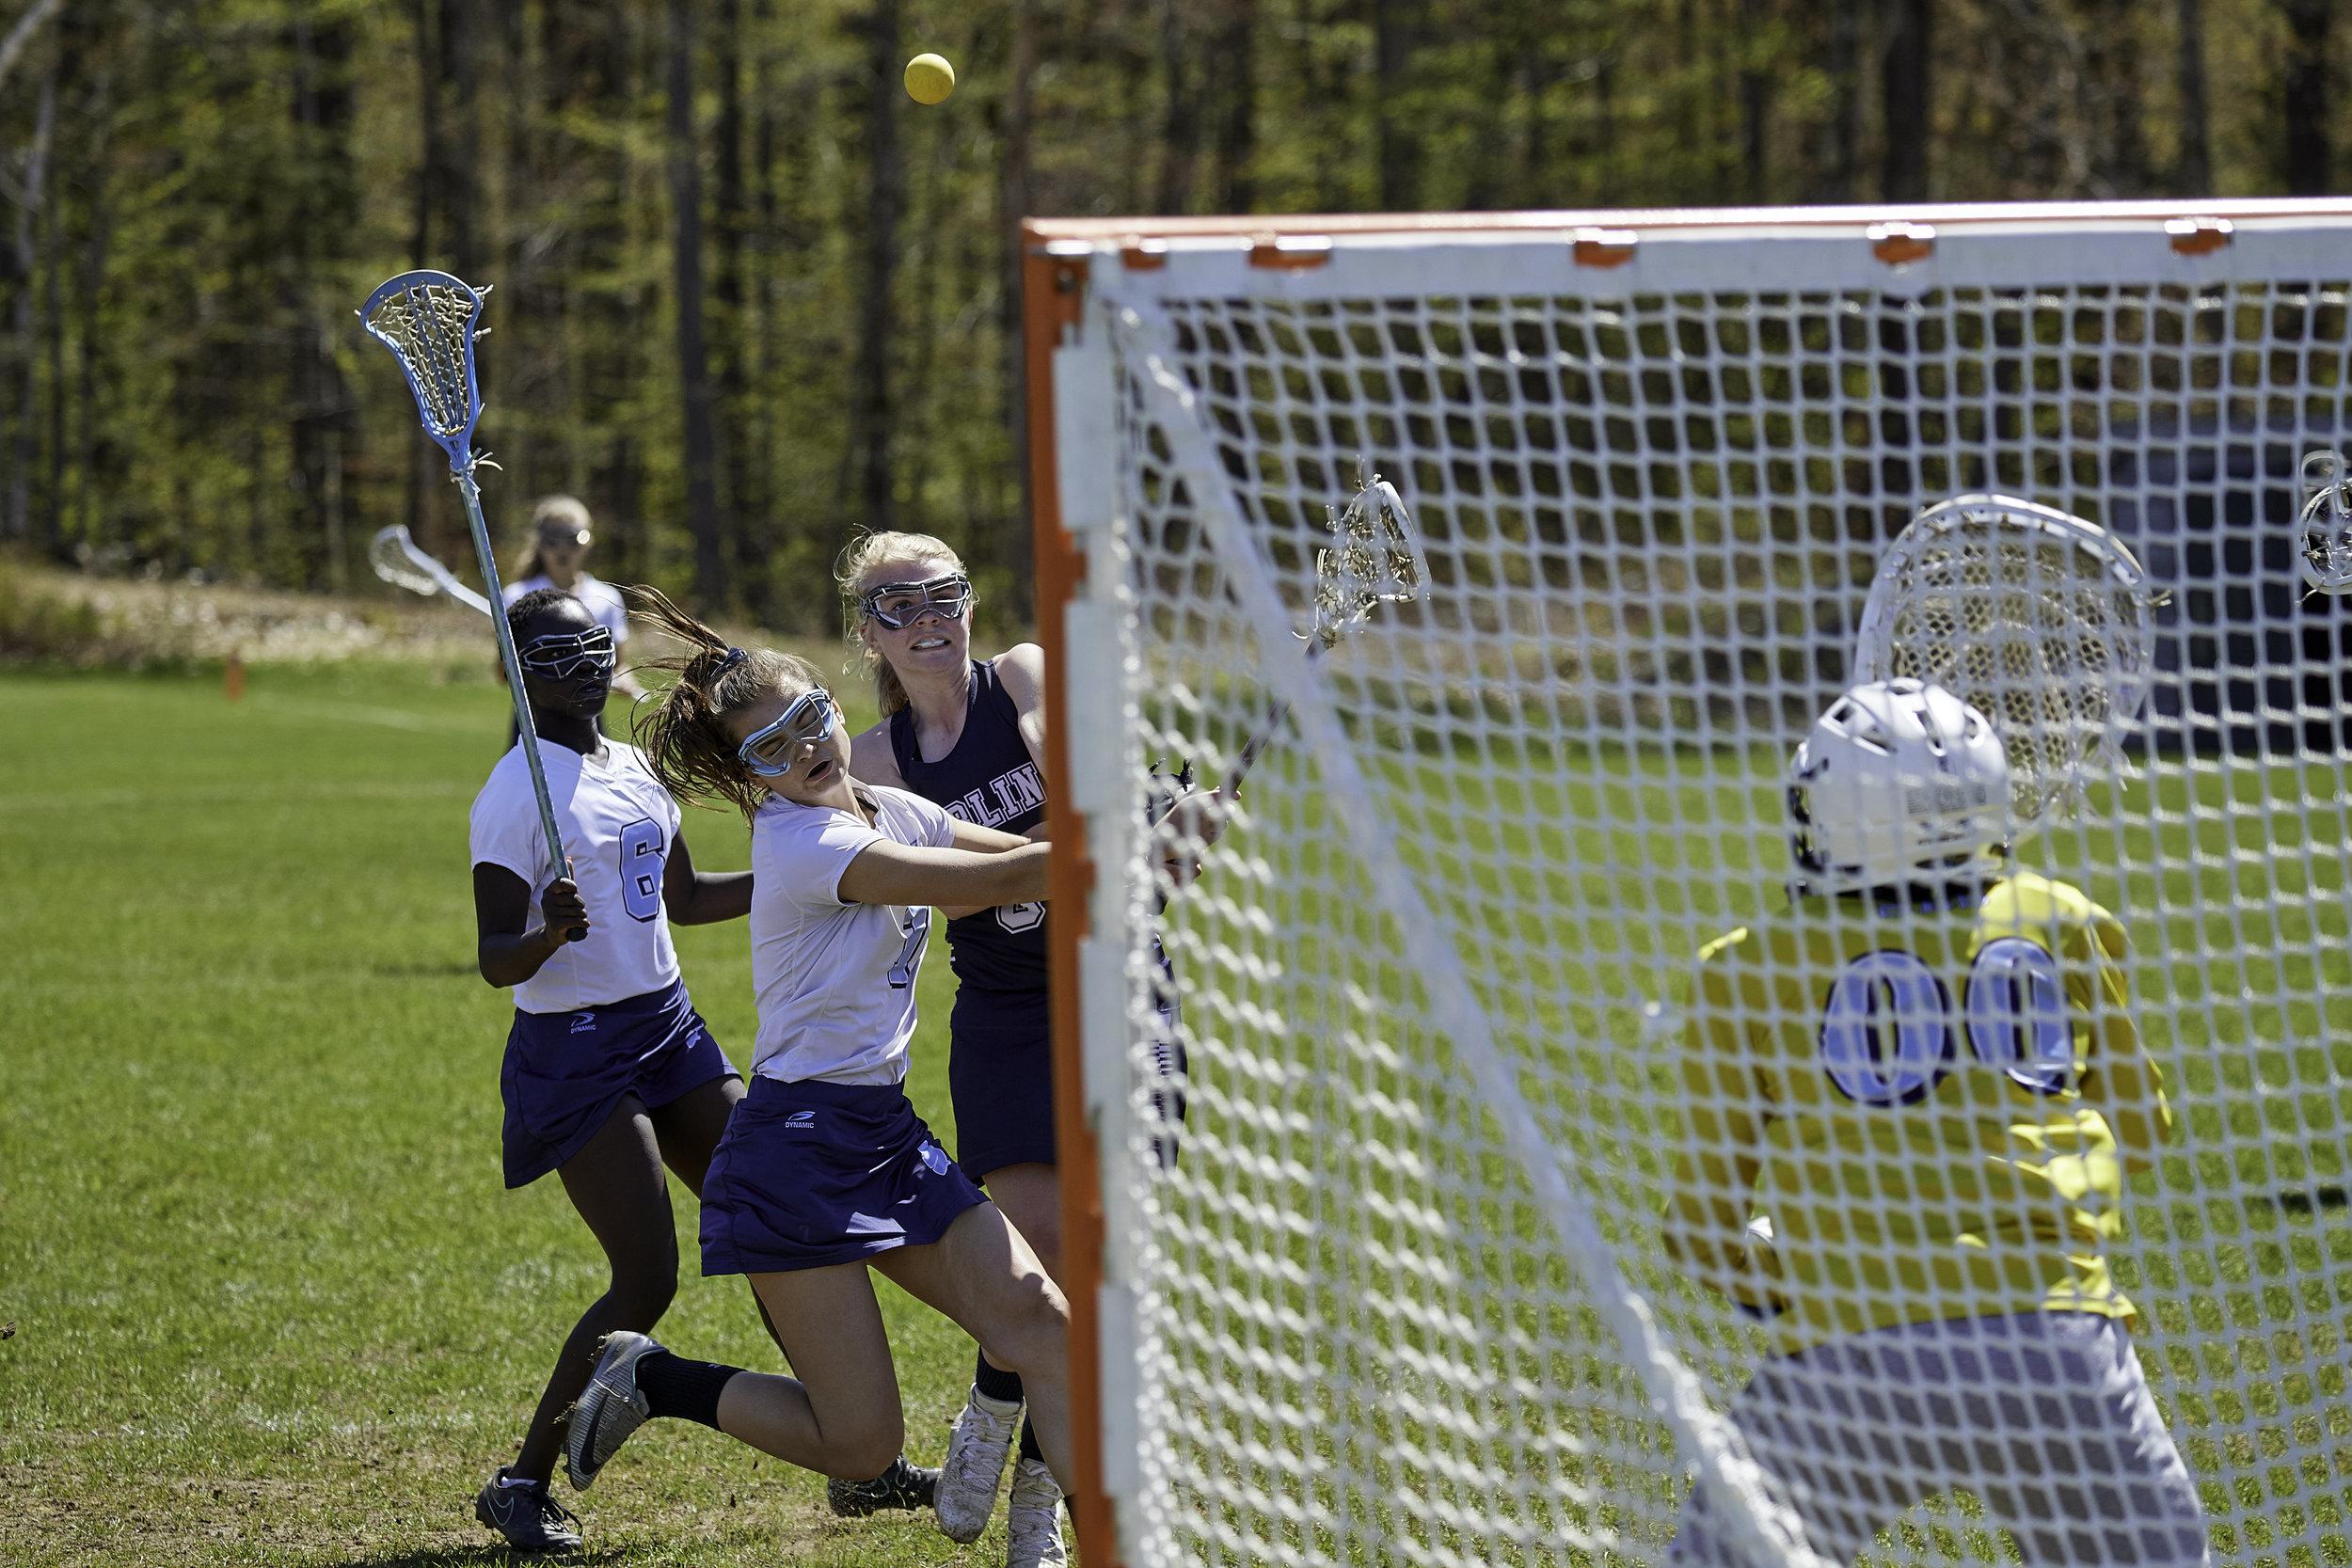 Girls Lacrosse vs. Stoneleigh Burnham School - May 11, 2019 - May 10, 2019193252.jpg